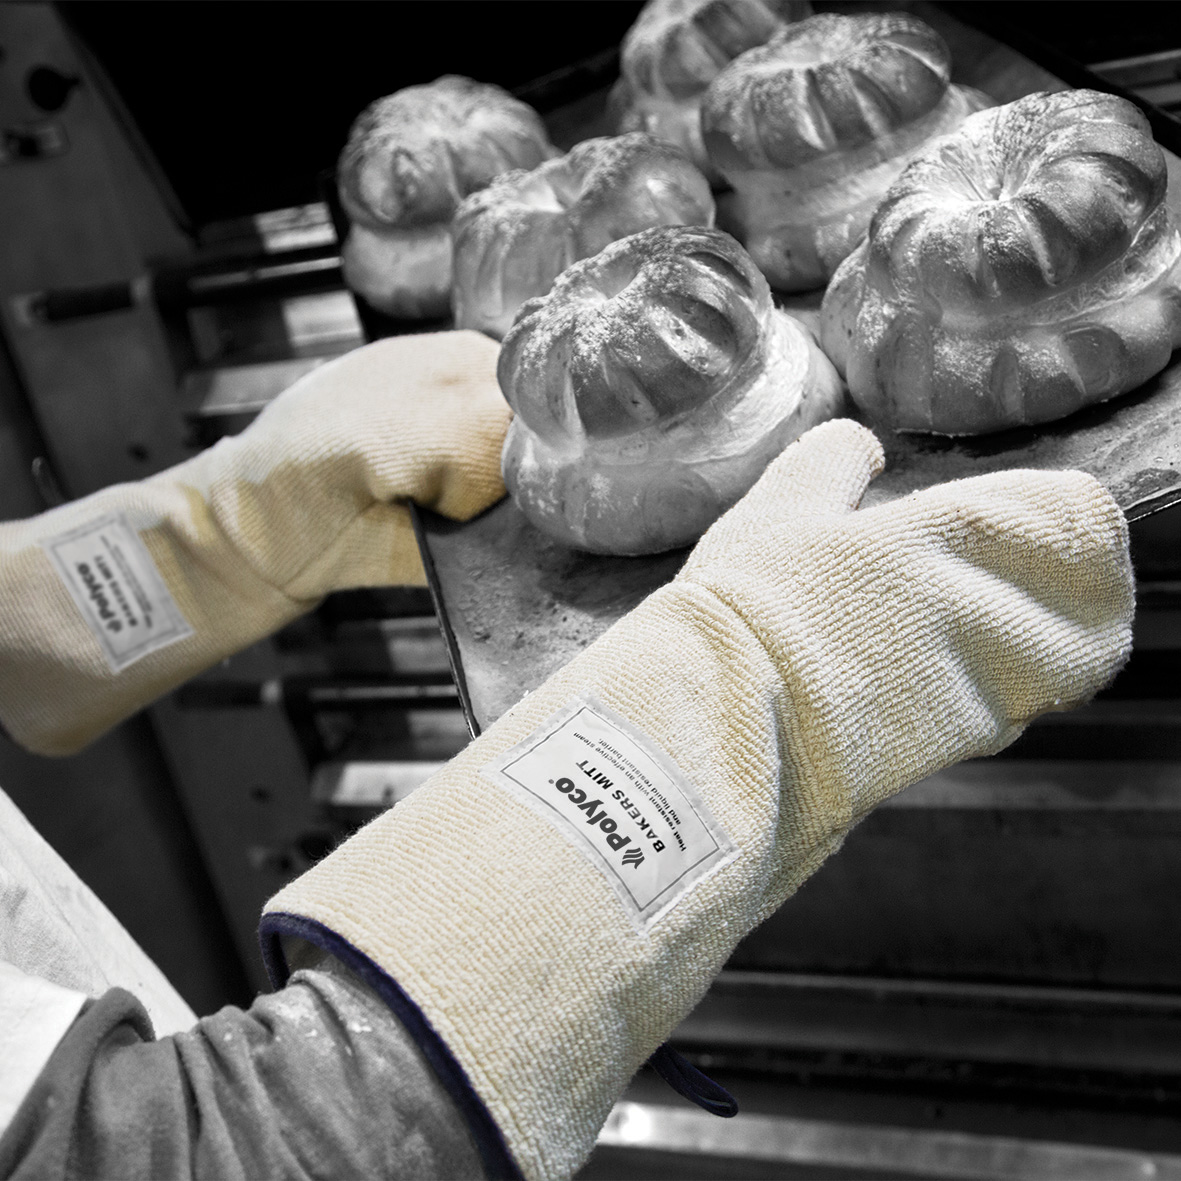 Food Manufacturing & Preparation Gloves